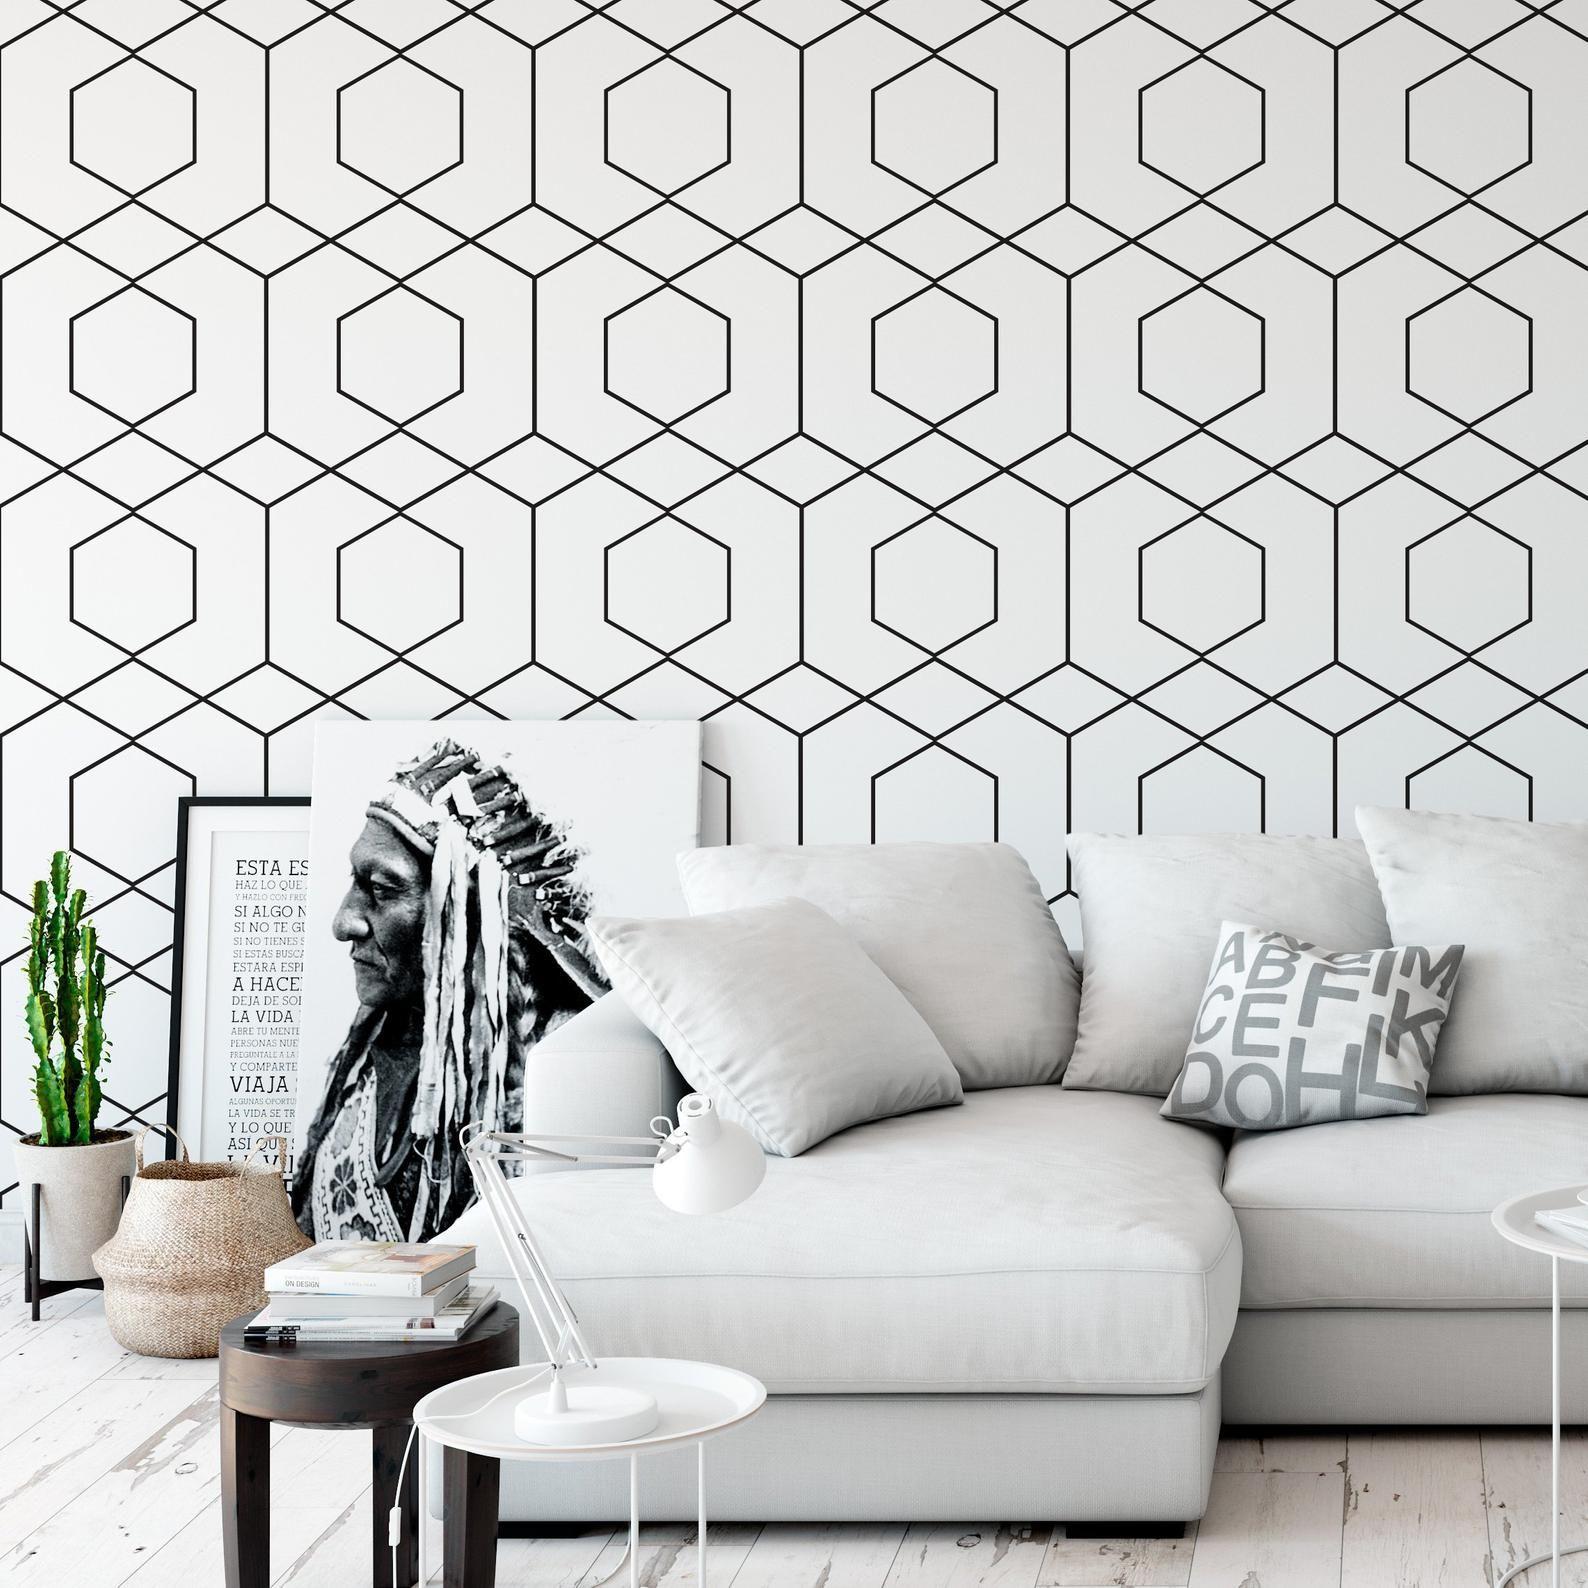 Geometric Hexagons Wallpaper Roll Black And White Wallpaper Etsy Geometric Hexagon Wallpaper Hexagon Wallpaper Black And White Wallpaper